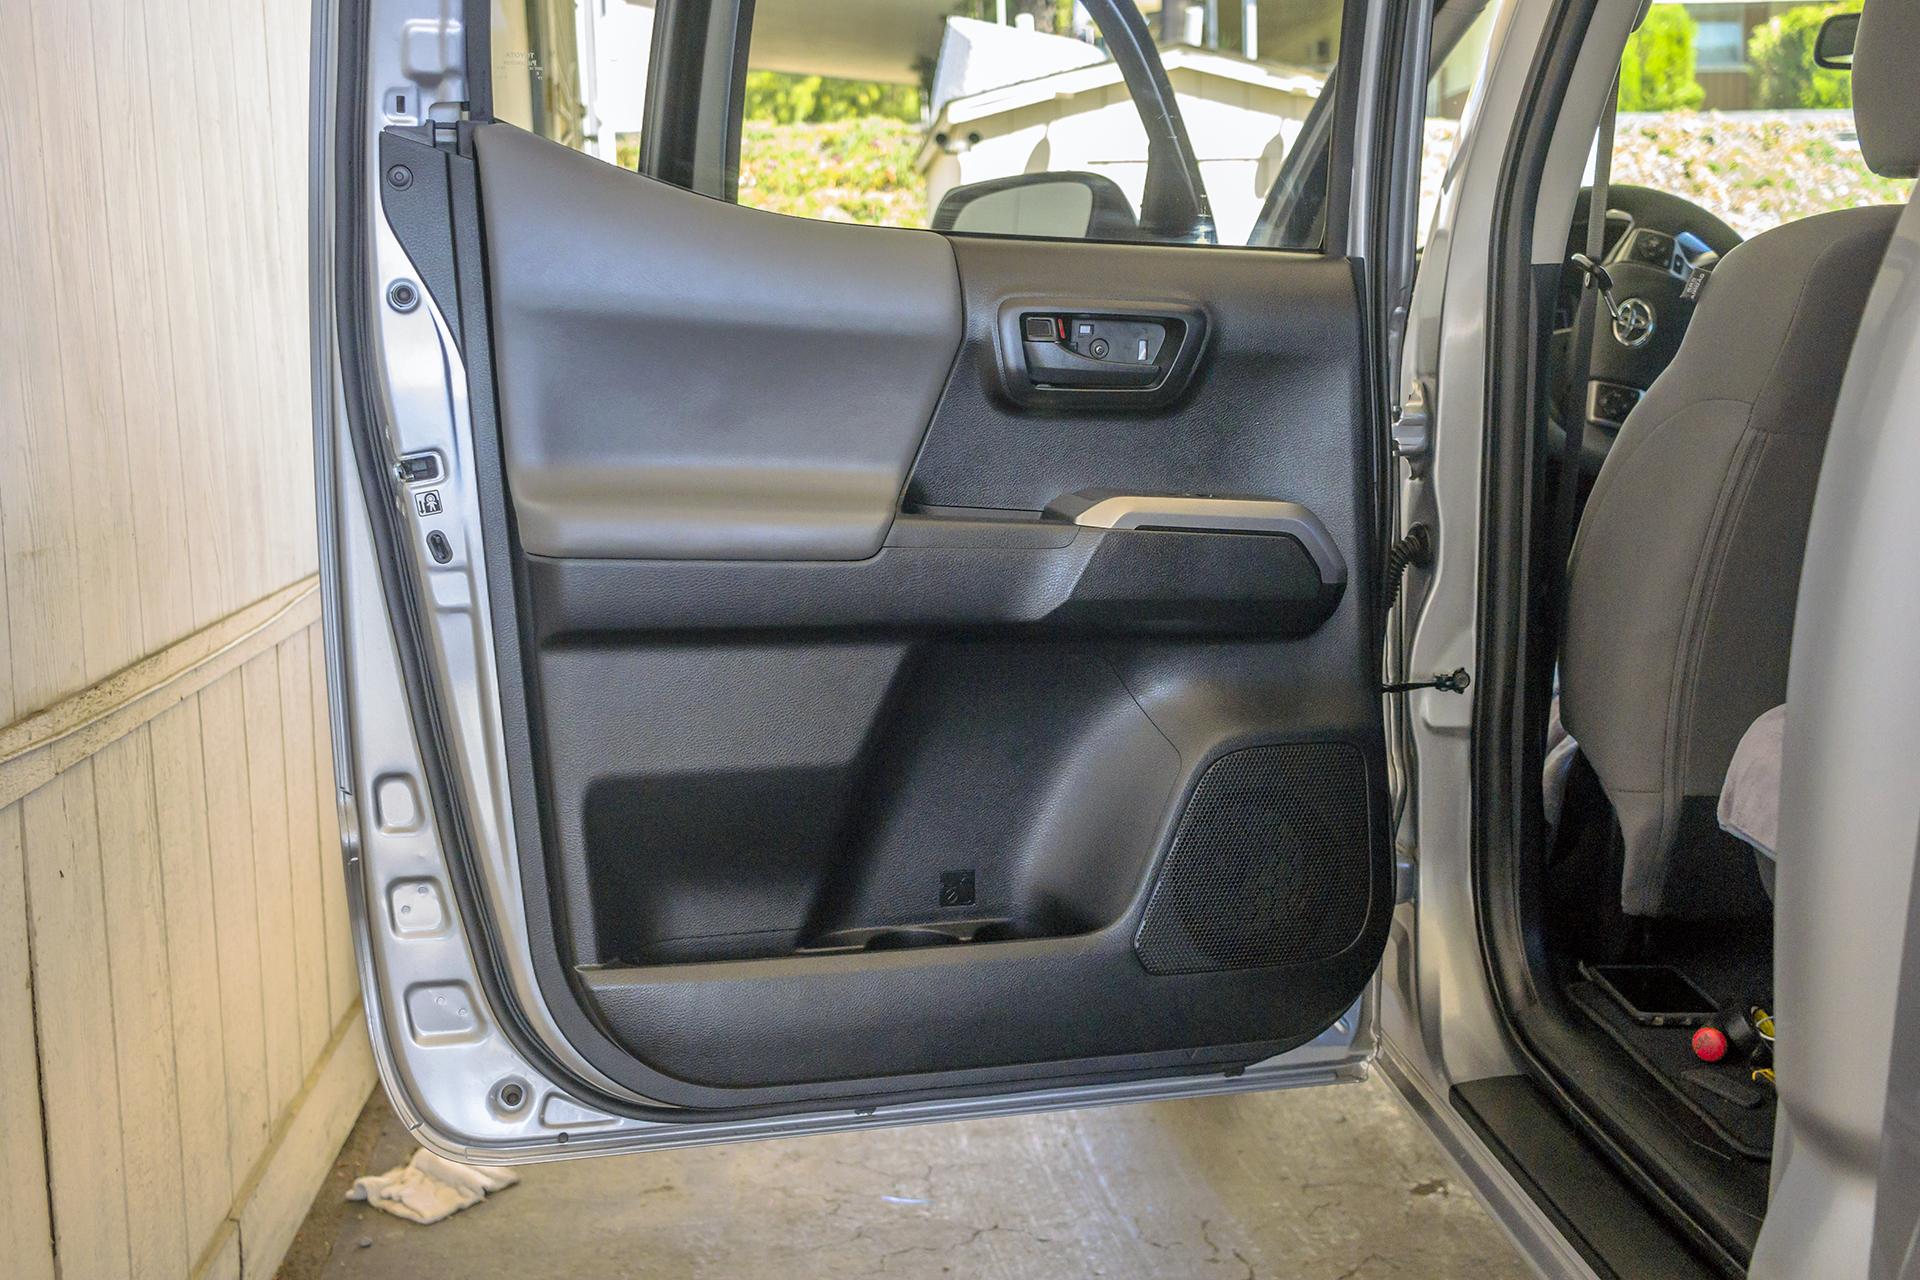 2018 Toyota Tacoma gets all new speakers! — Twelve Volt